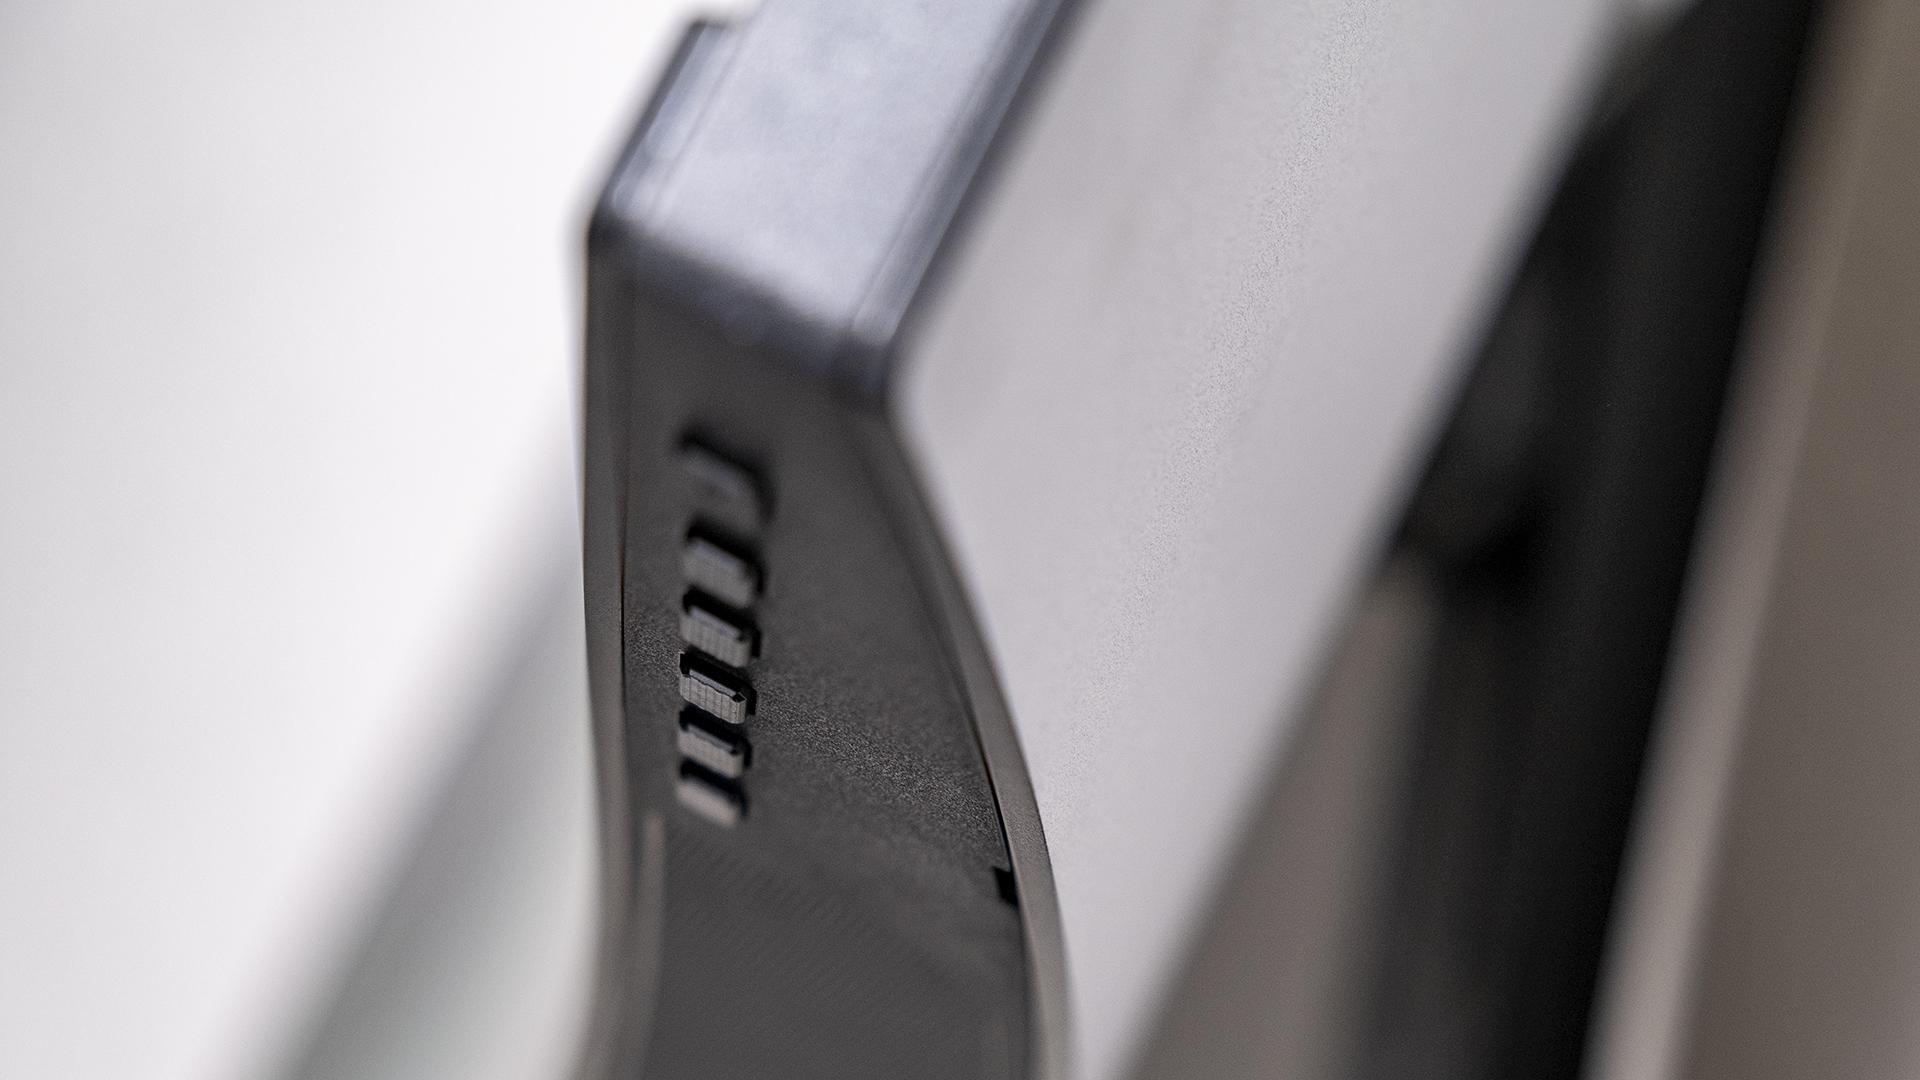 ViewSonic VP3481 ColorPro OSD Tasten Keys